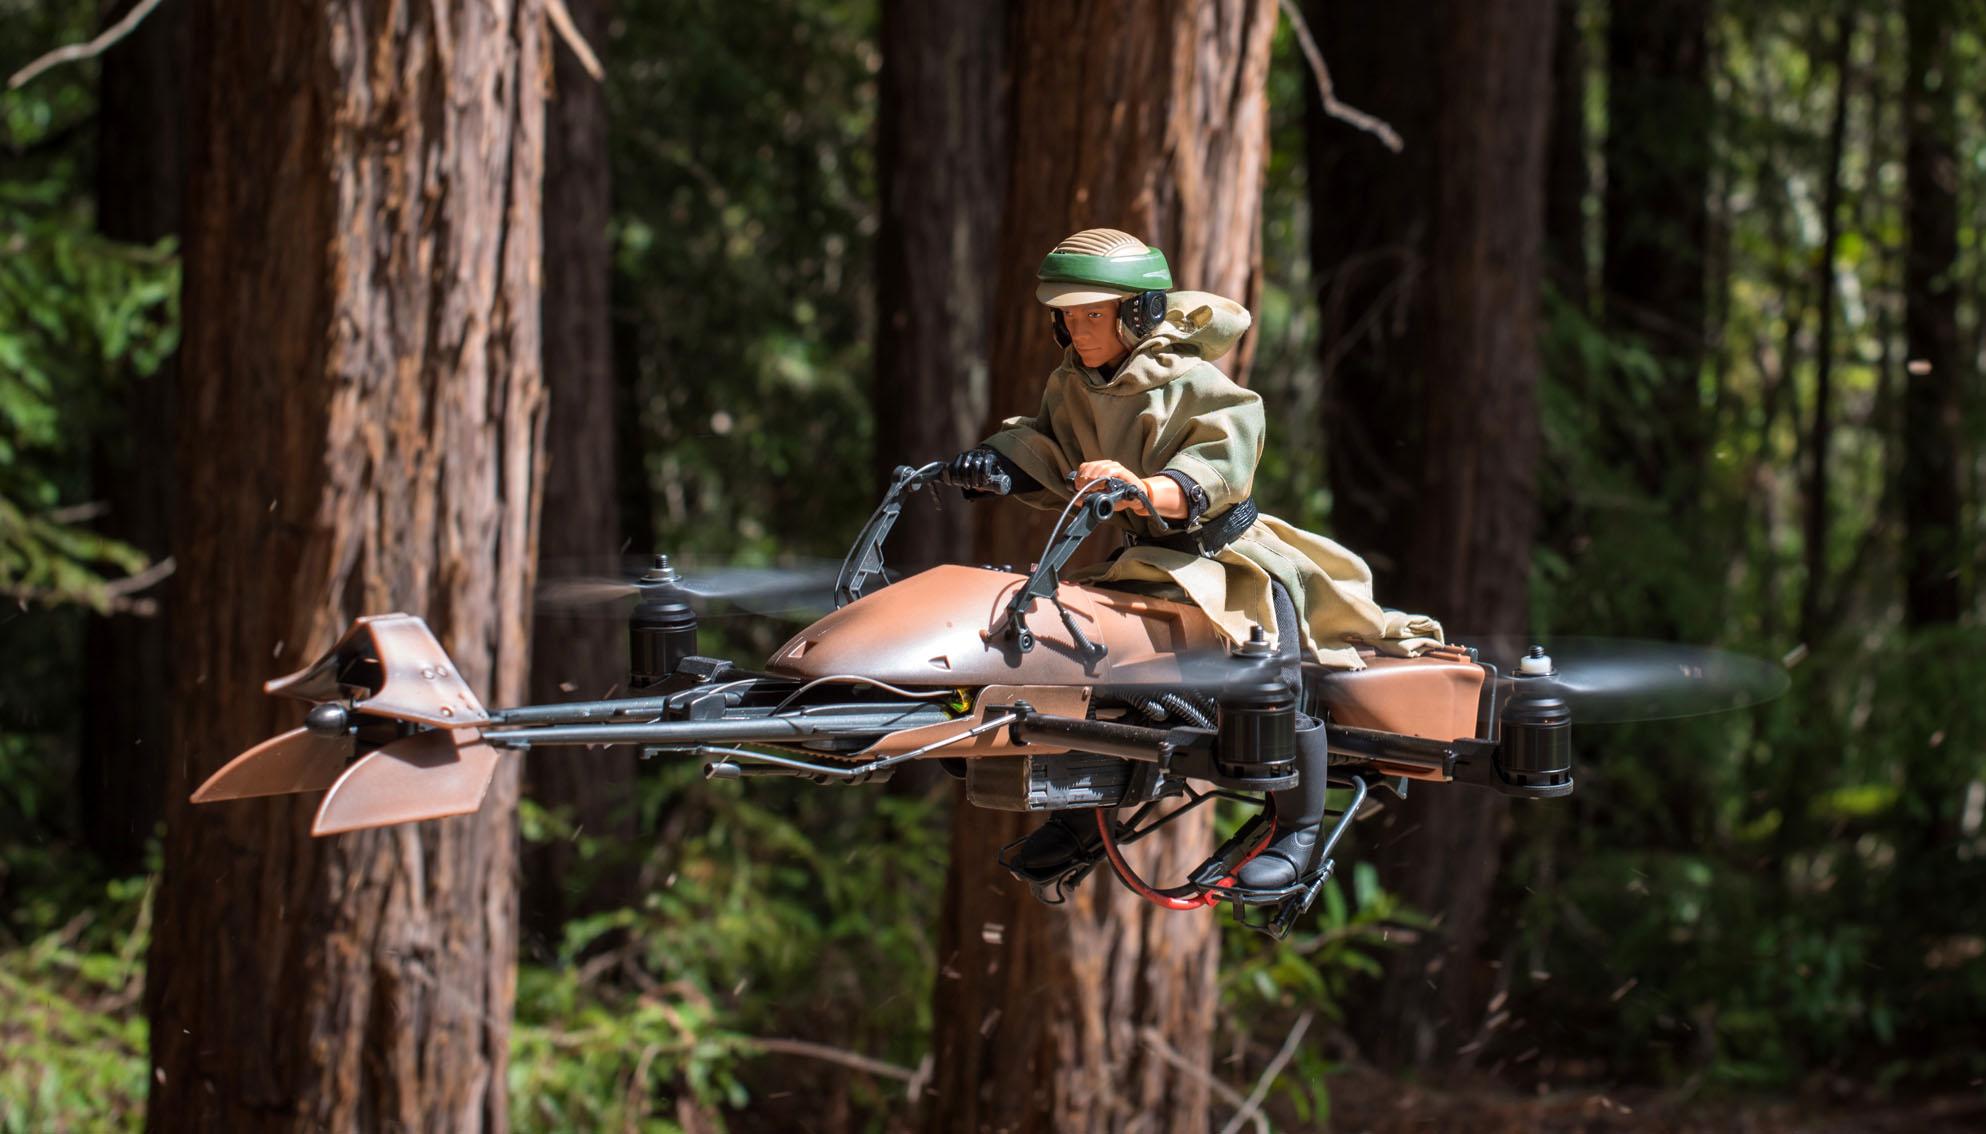 Skywalker vs. Stormtrooper: Endor Speeder Bike Quadcopter Battle